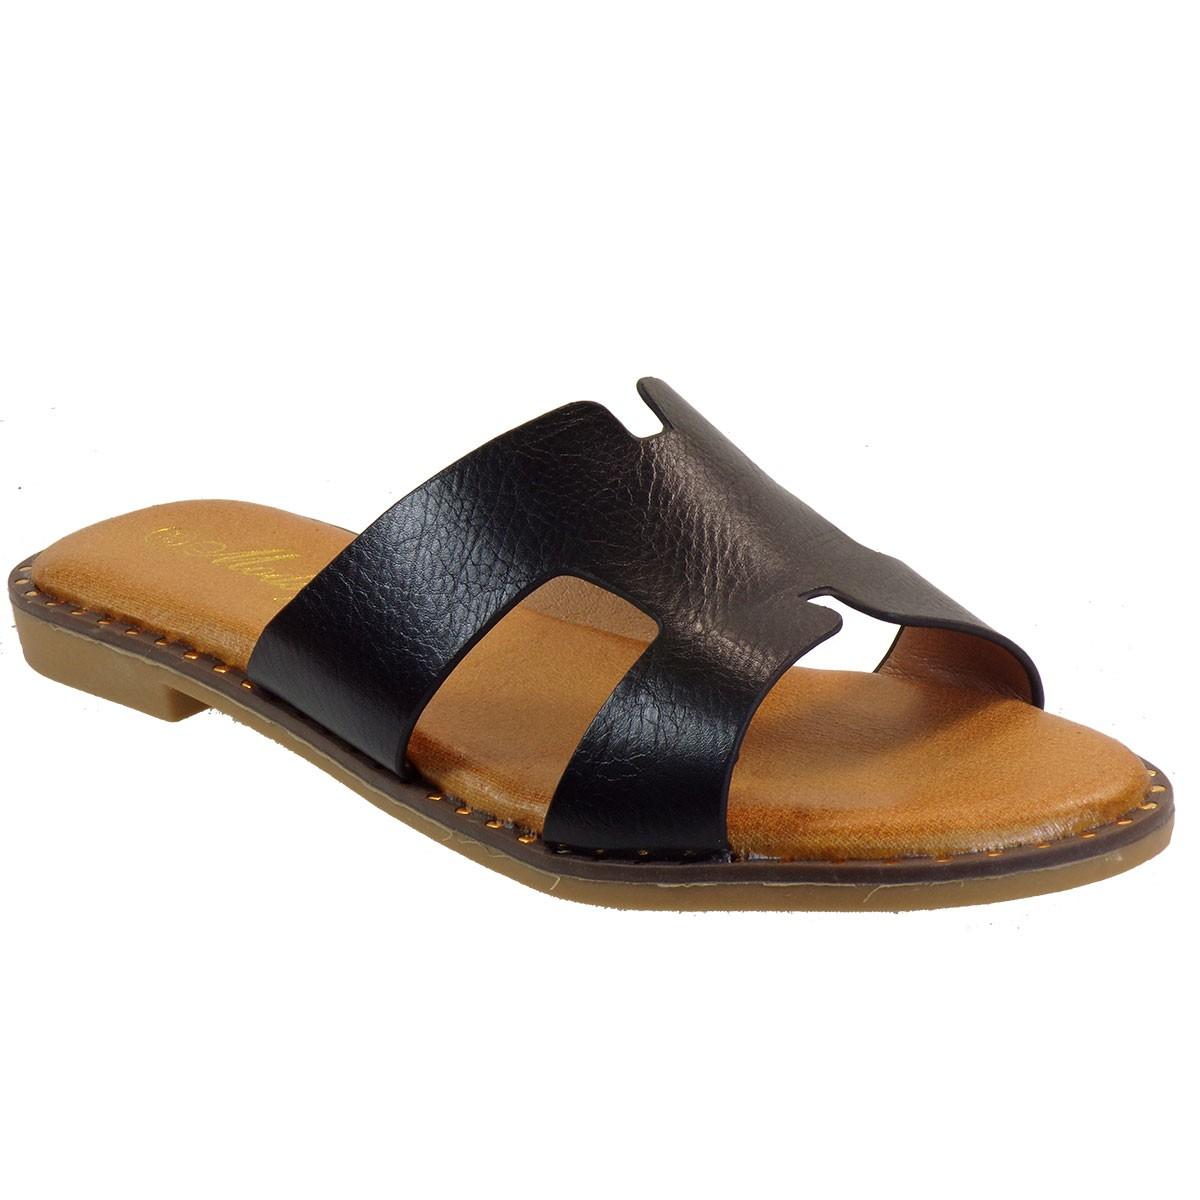 Bagiota Shoes Γυναικείες Παντόφλες CO32 Μαύρο